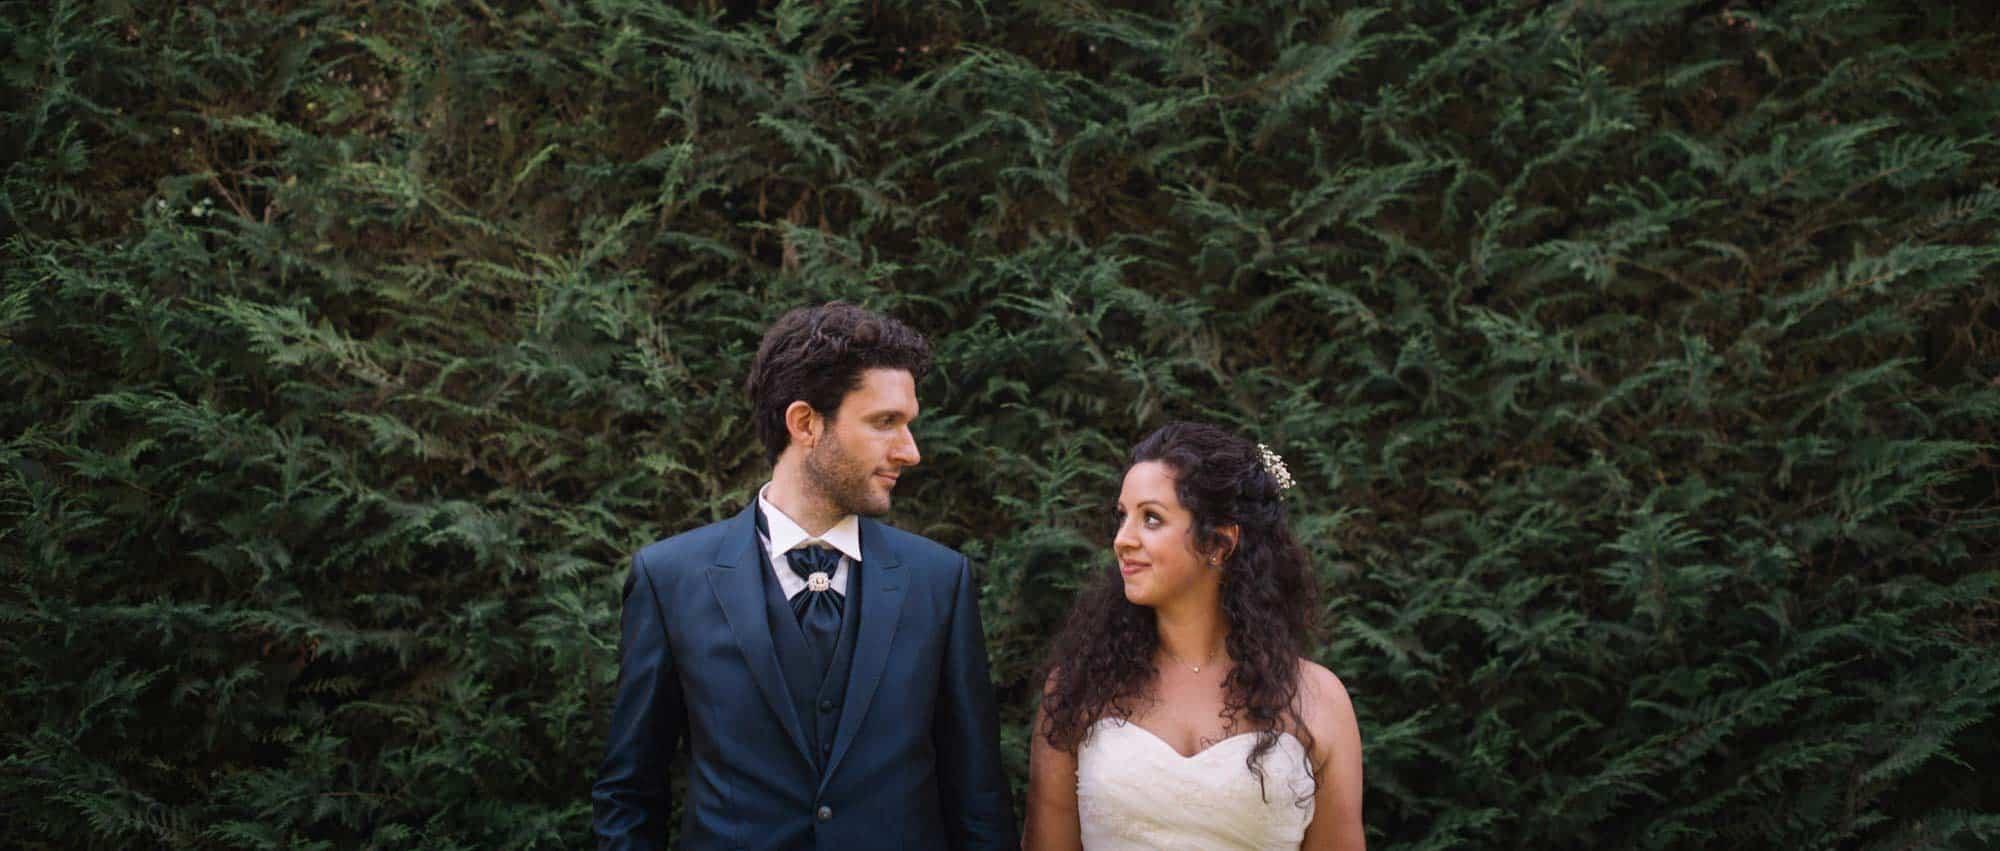 Matrimonio Simbolico Verona - Fotografo Matrimonio Verona